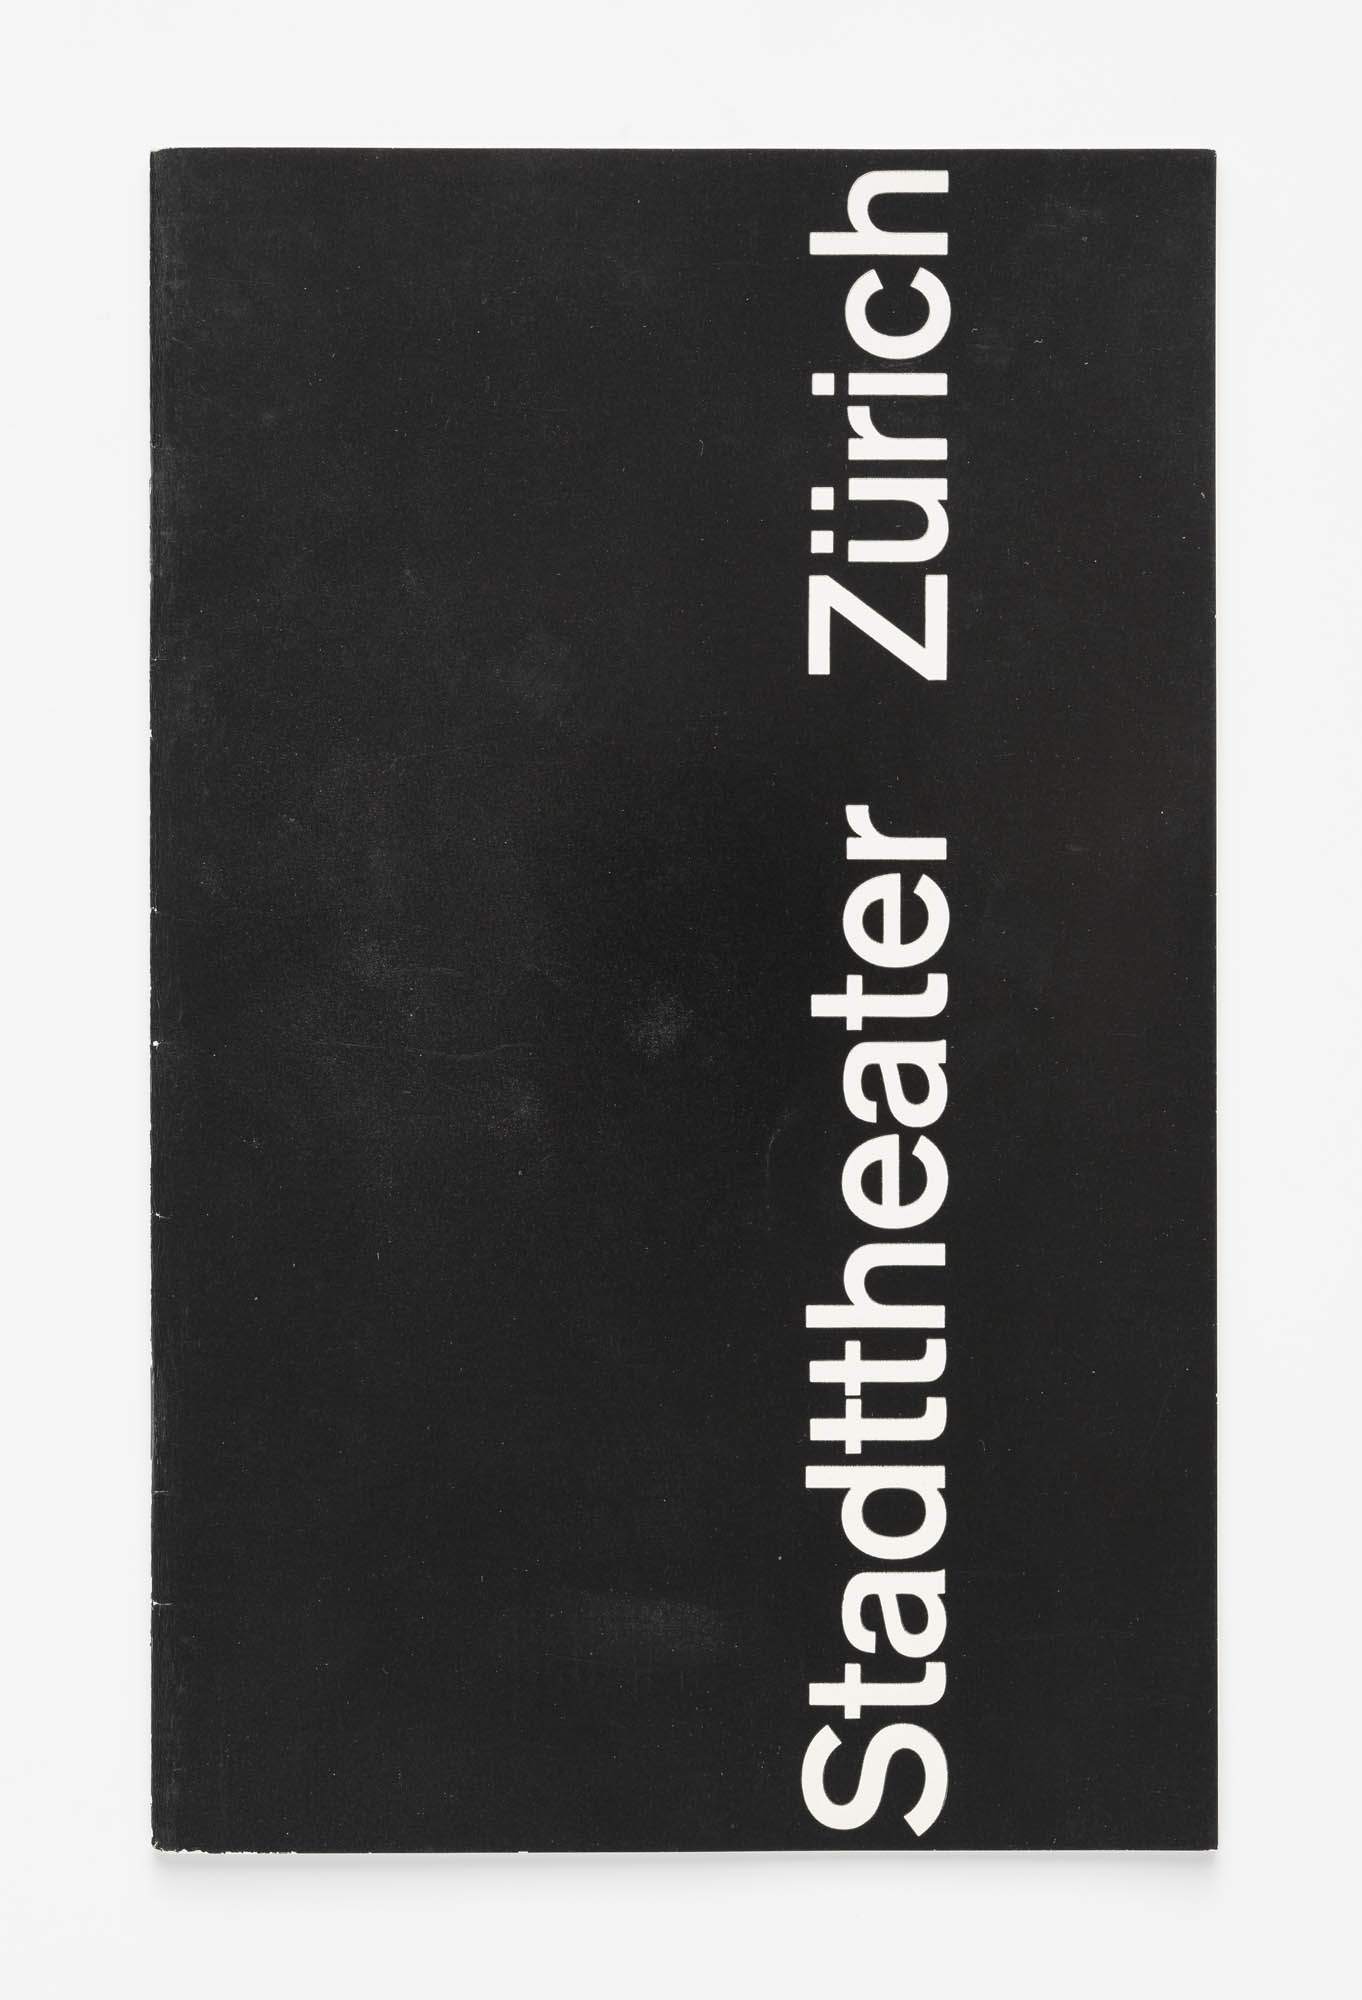 Juni-Festwochen Zürich Josef Müller-Brockmann Programmvorschau